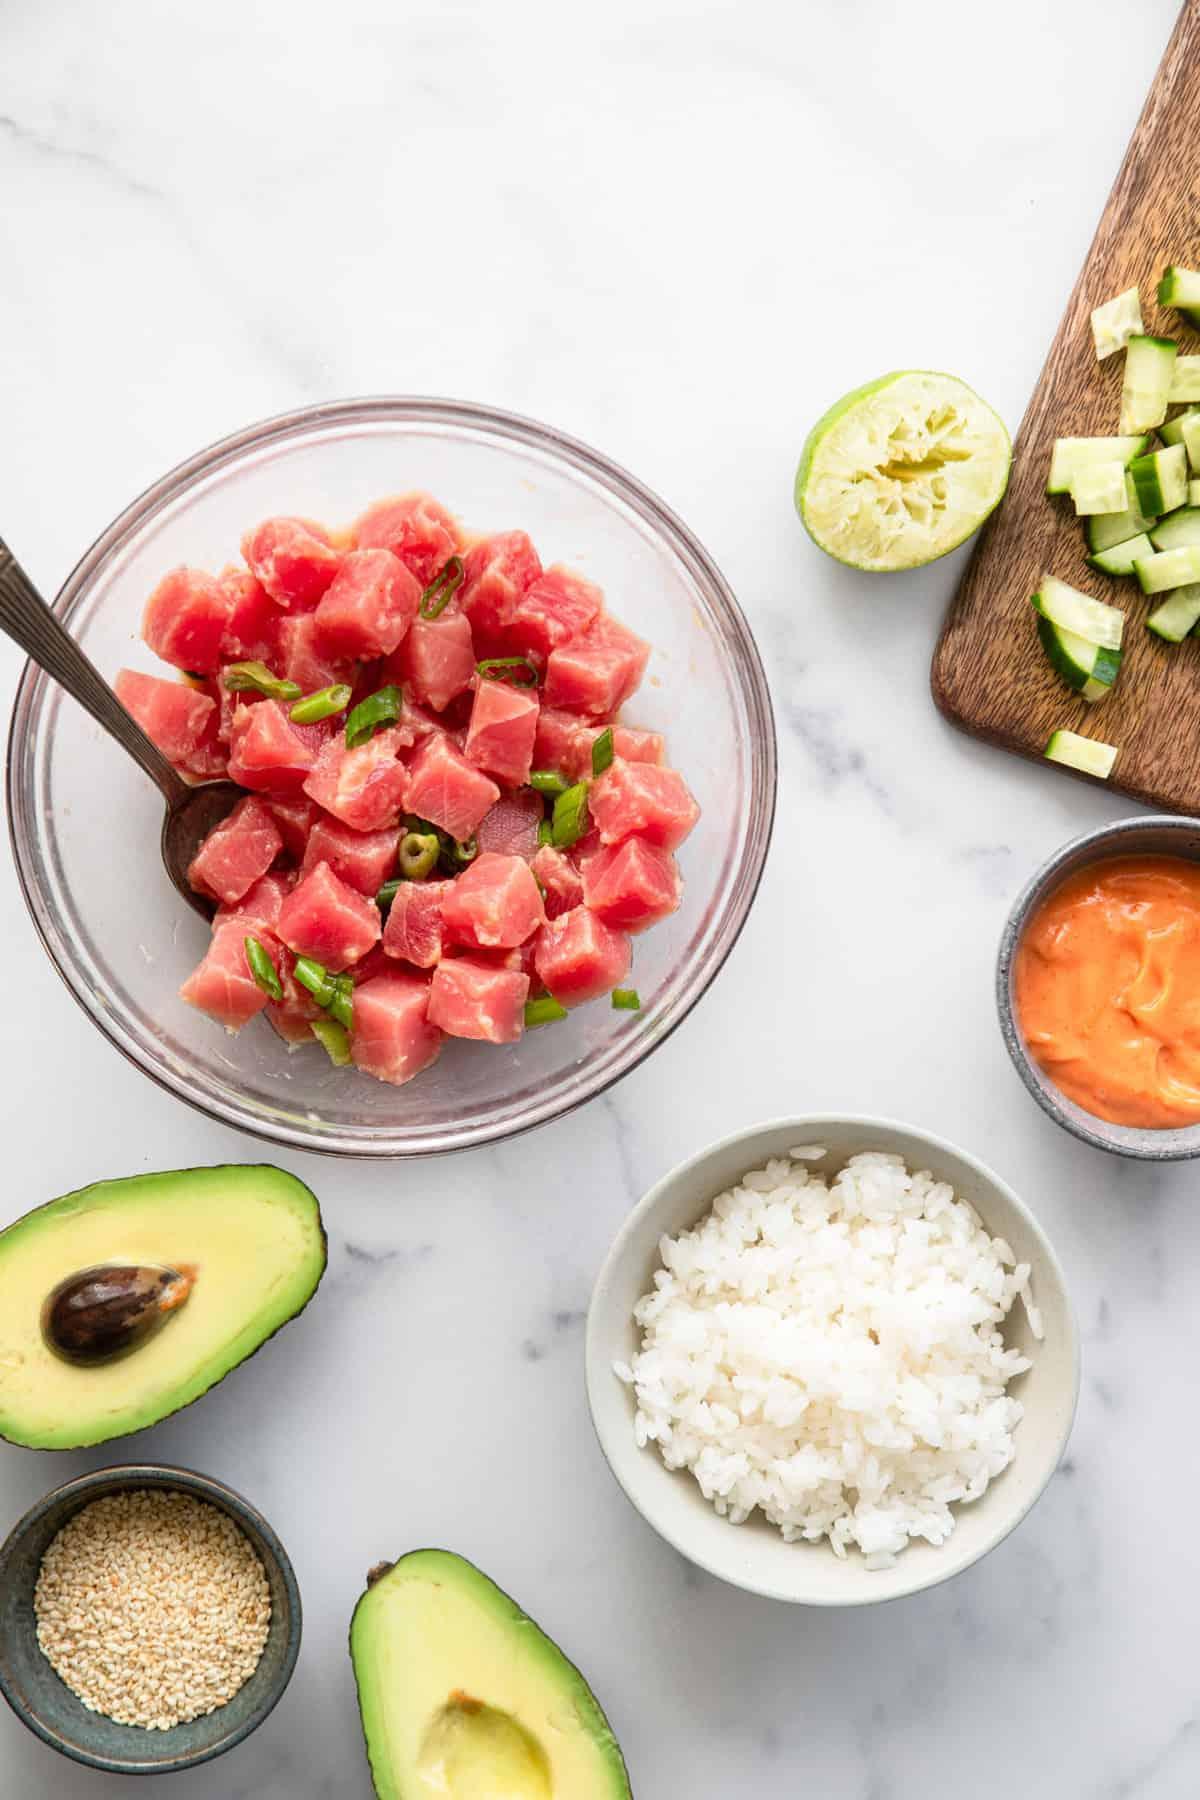 tuna bowl ingredients being prepped